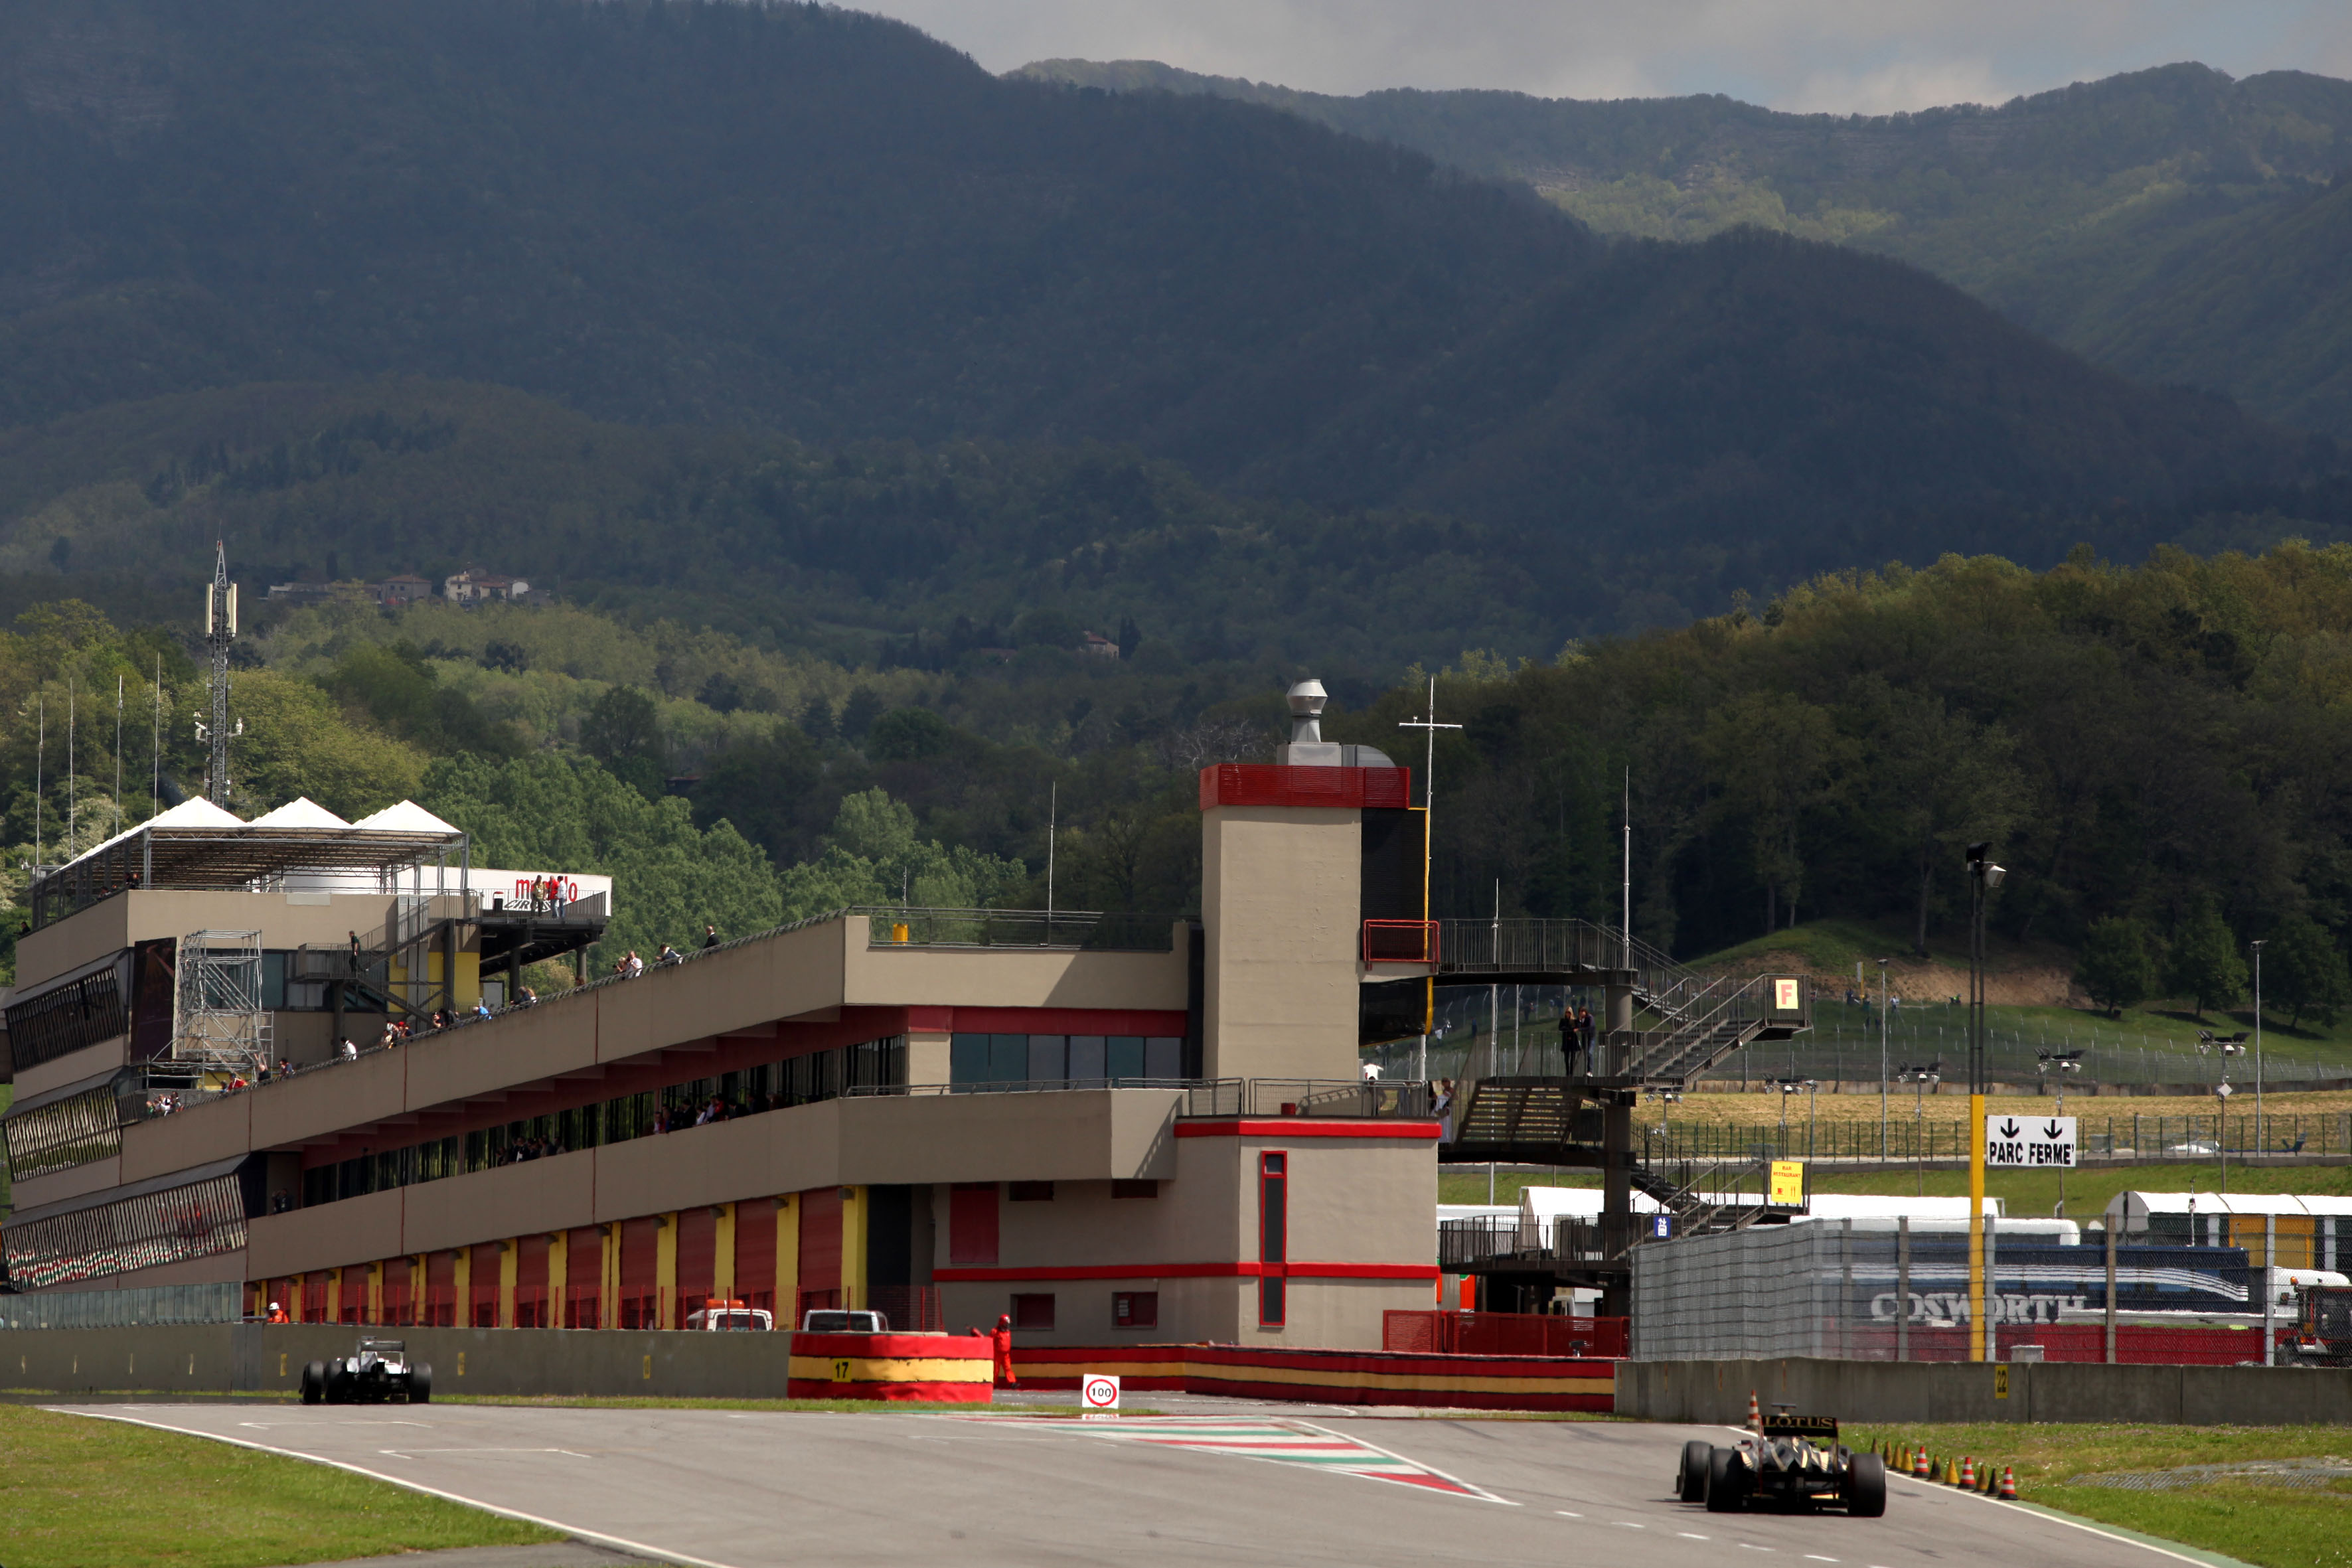 Motor Racing Formula One World Championship Formula 1 Testing Day 3 Mugello, Italy